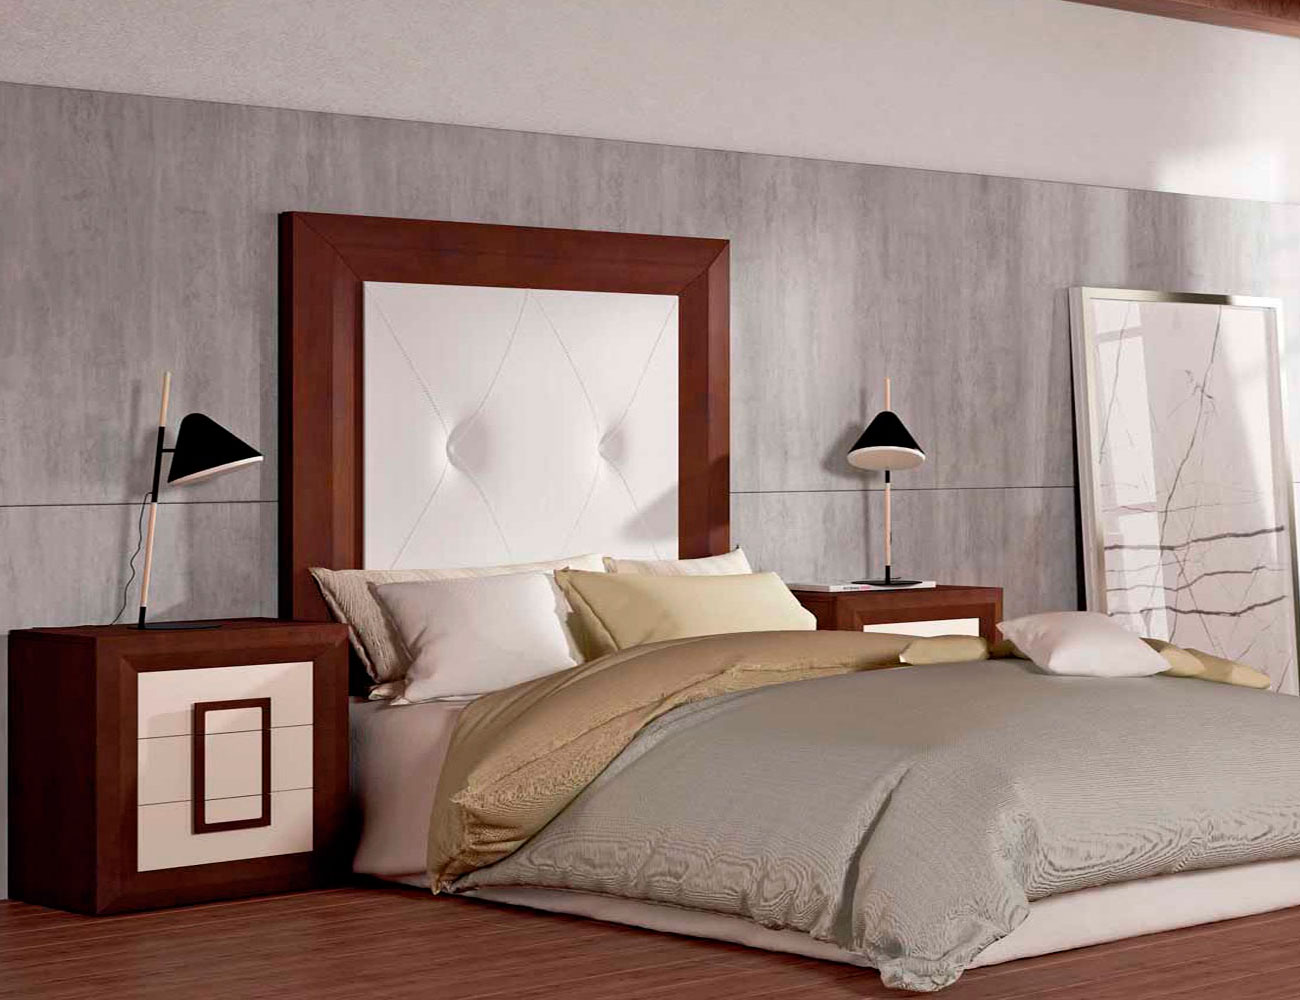 Dormitorio de matrimonio con cabecero tapizado en color - Dormitorios con cabeceros tapizados ...